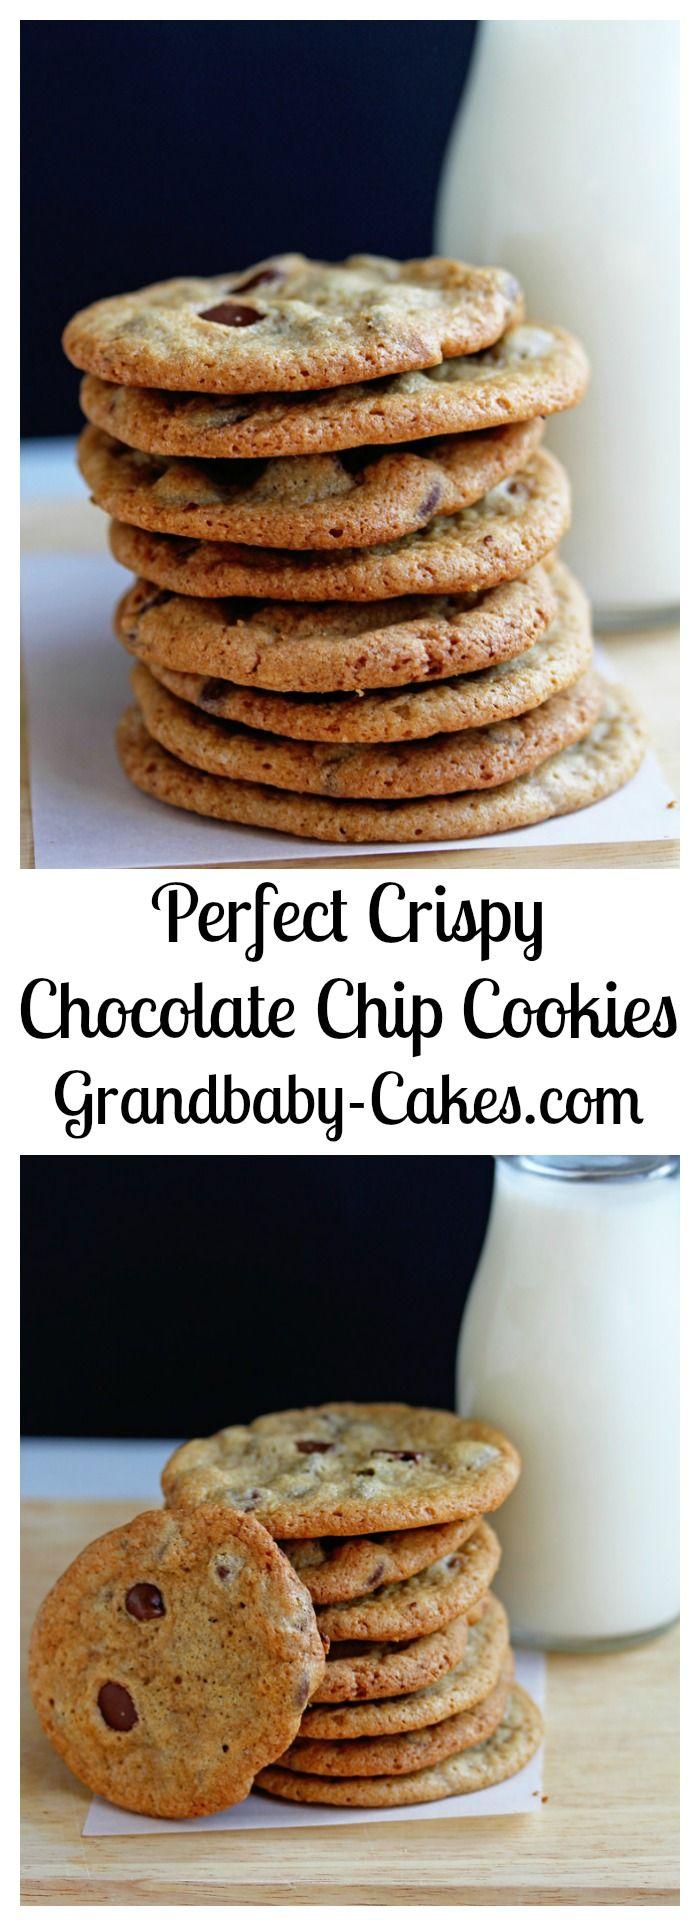 Perfect Crispy Chocolate Chip Cookies | Grandbaby-Cakes.com